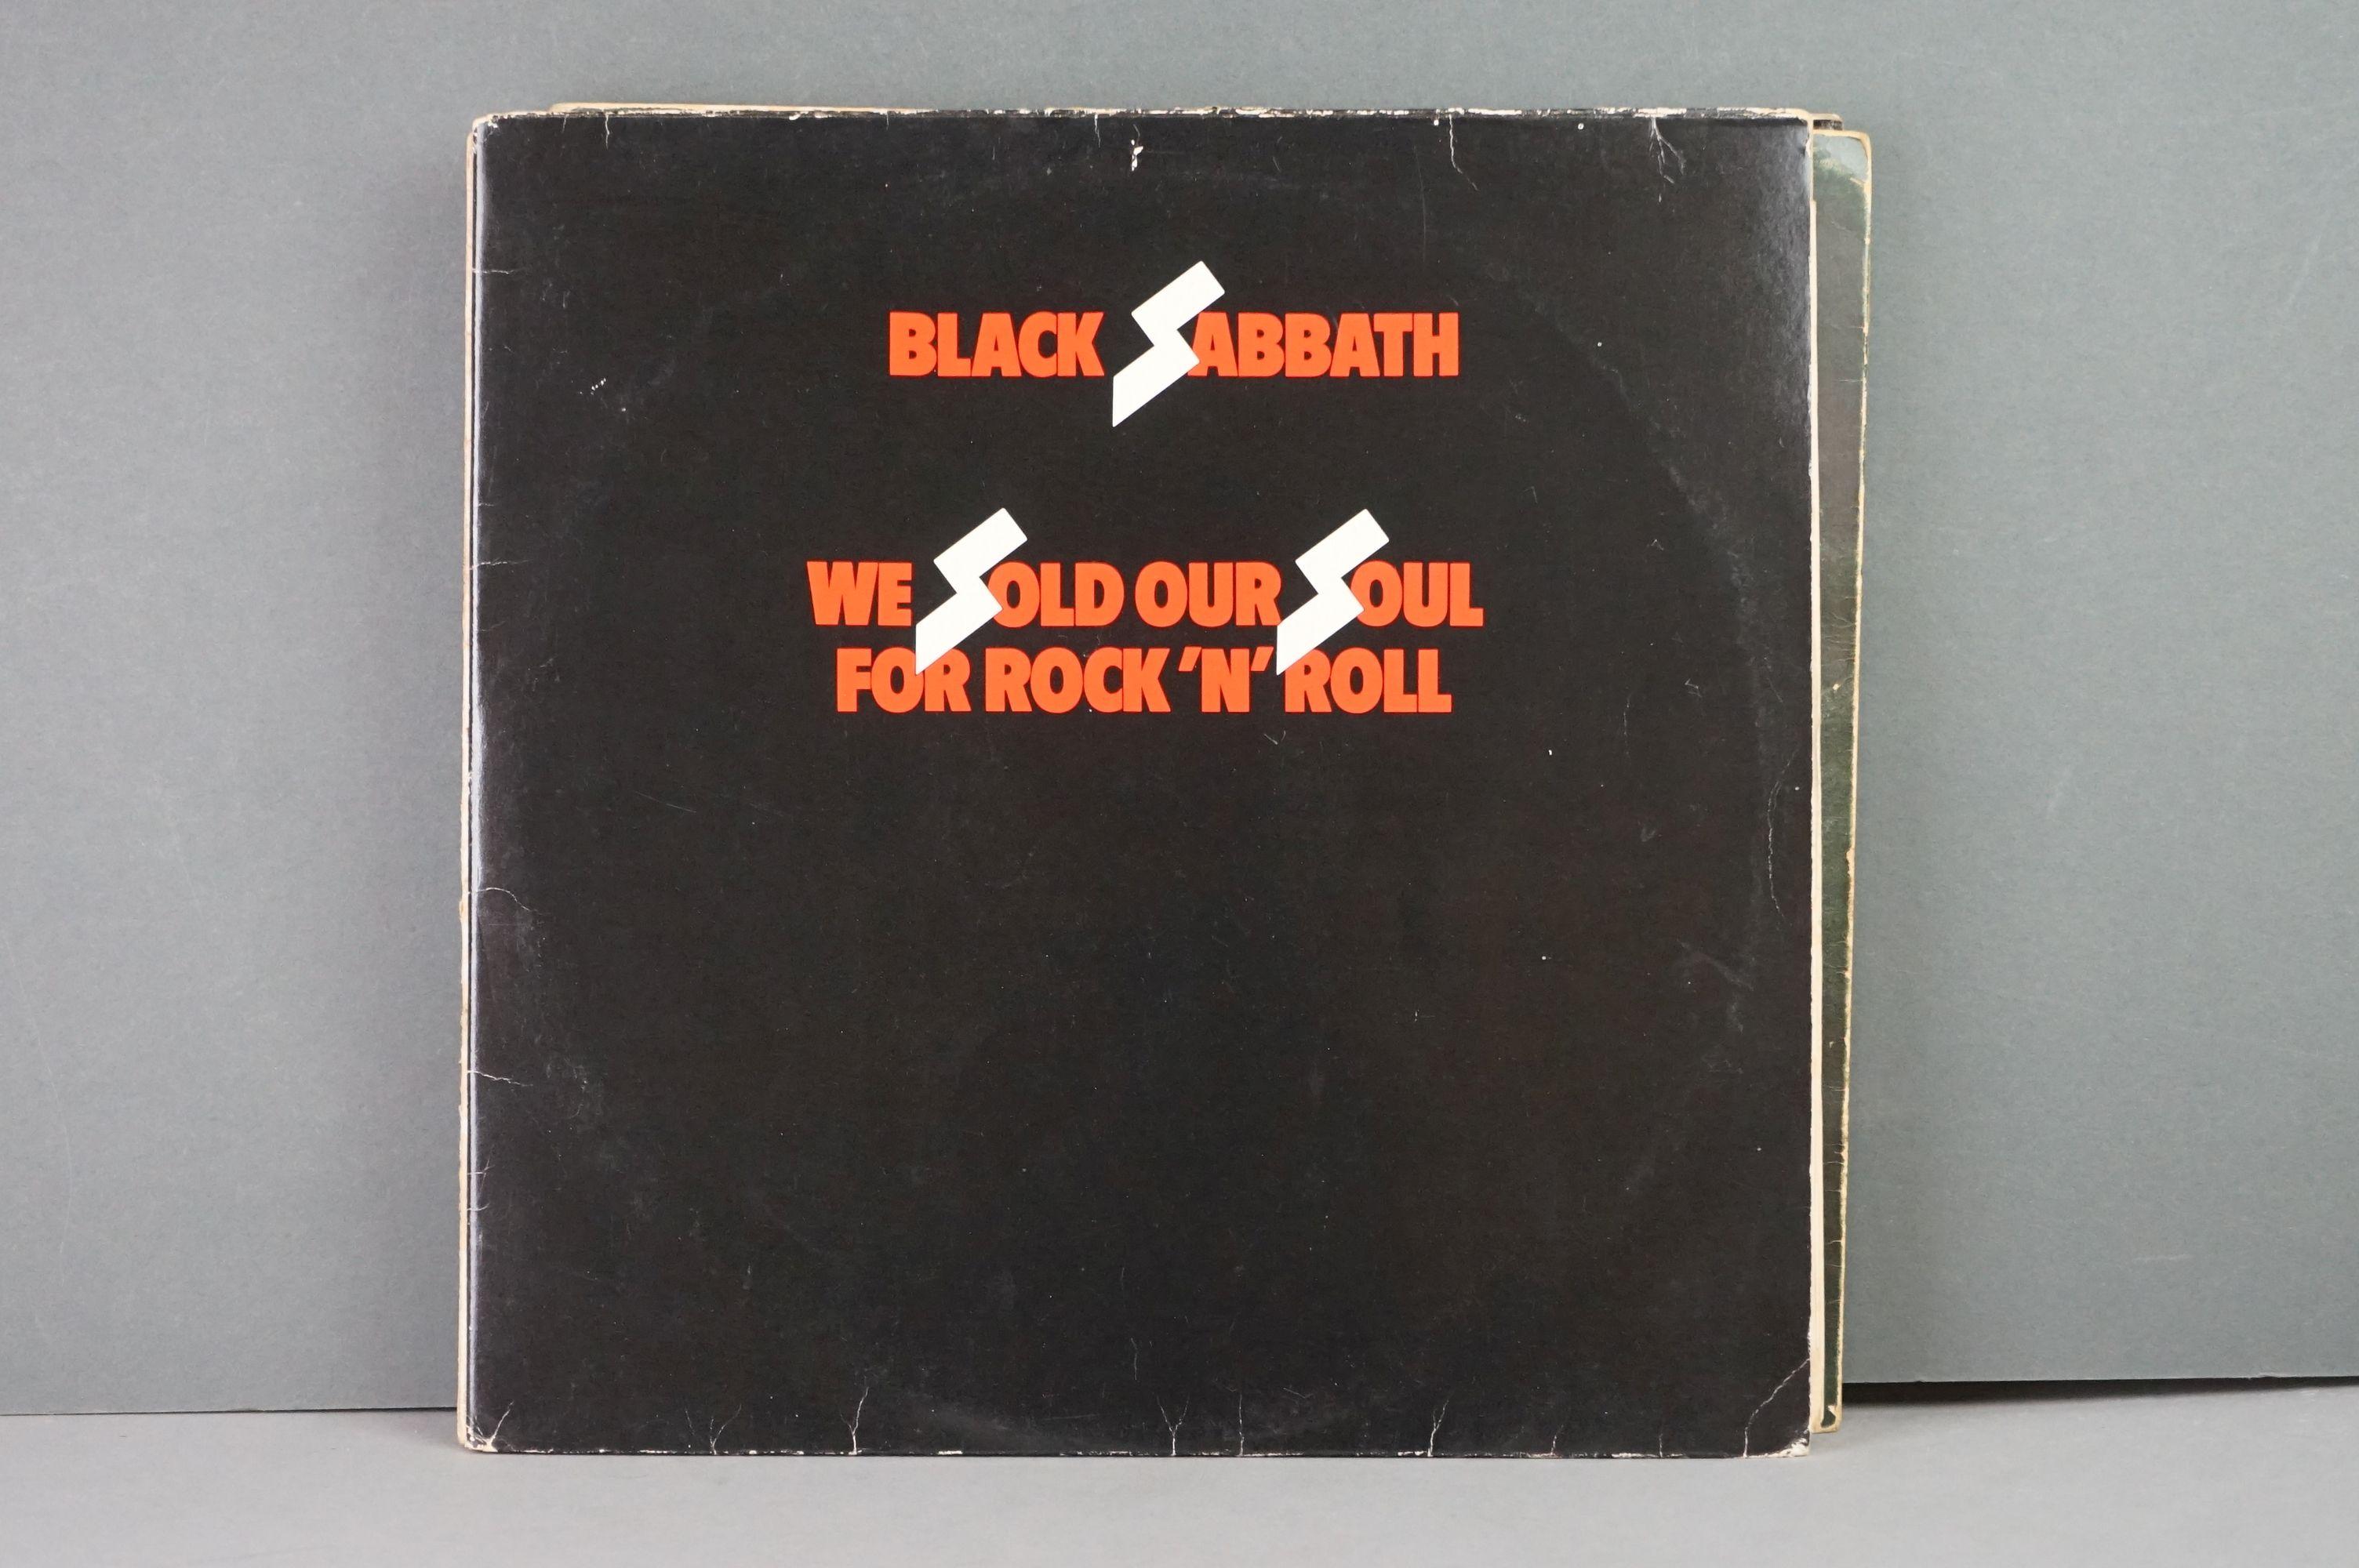 Vinyl - Twelve Black Sabbath vinyl LP's to include Technical Ecstasy (Vertigo Records PRICE 40), - Image 8 of 17